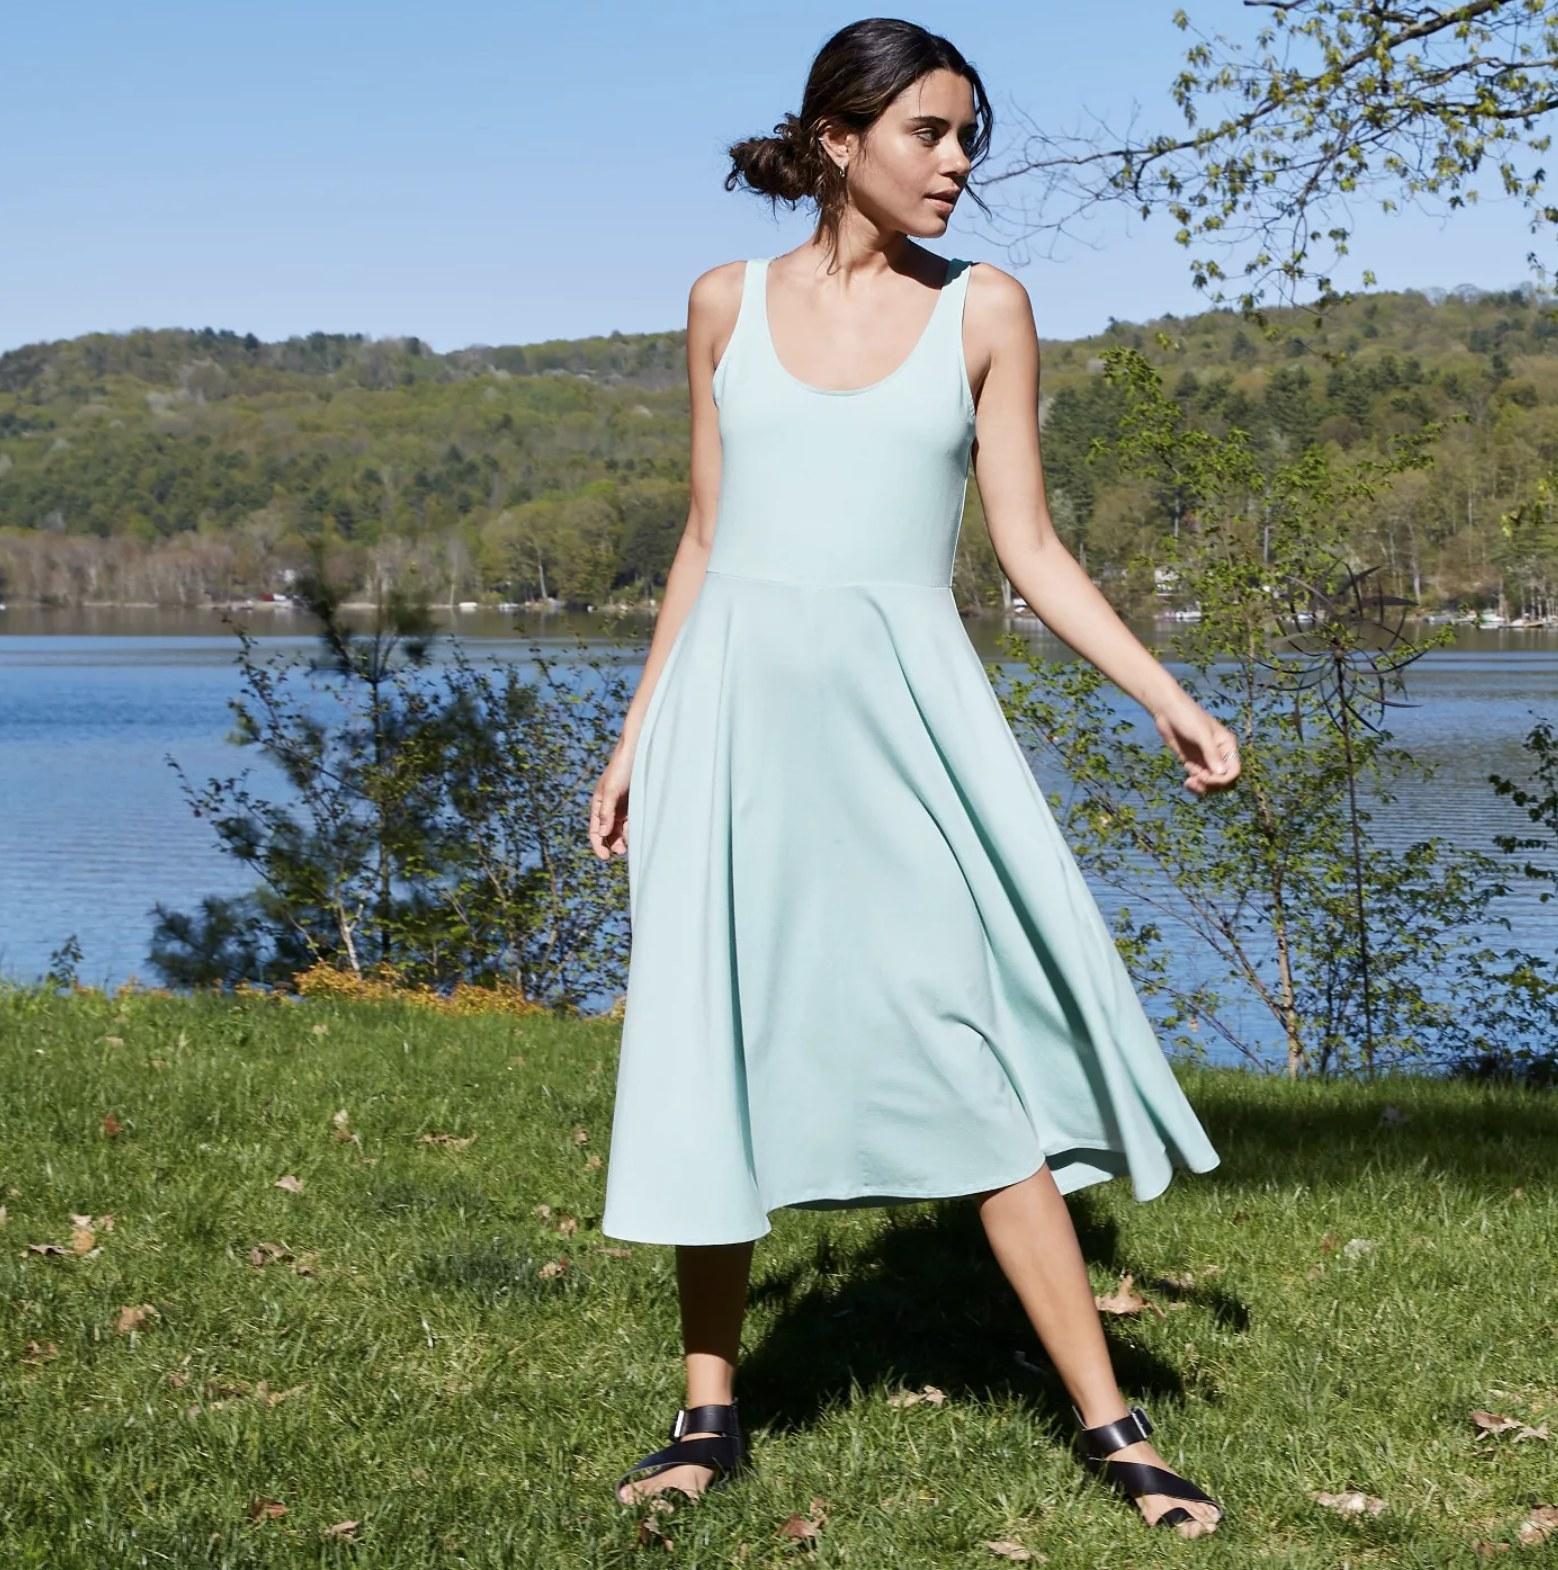 Model wearing the A-line T-shirt dress in light blue